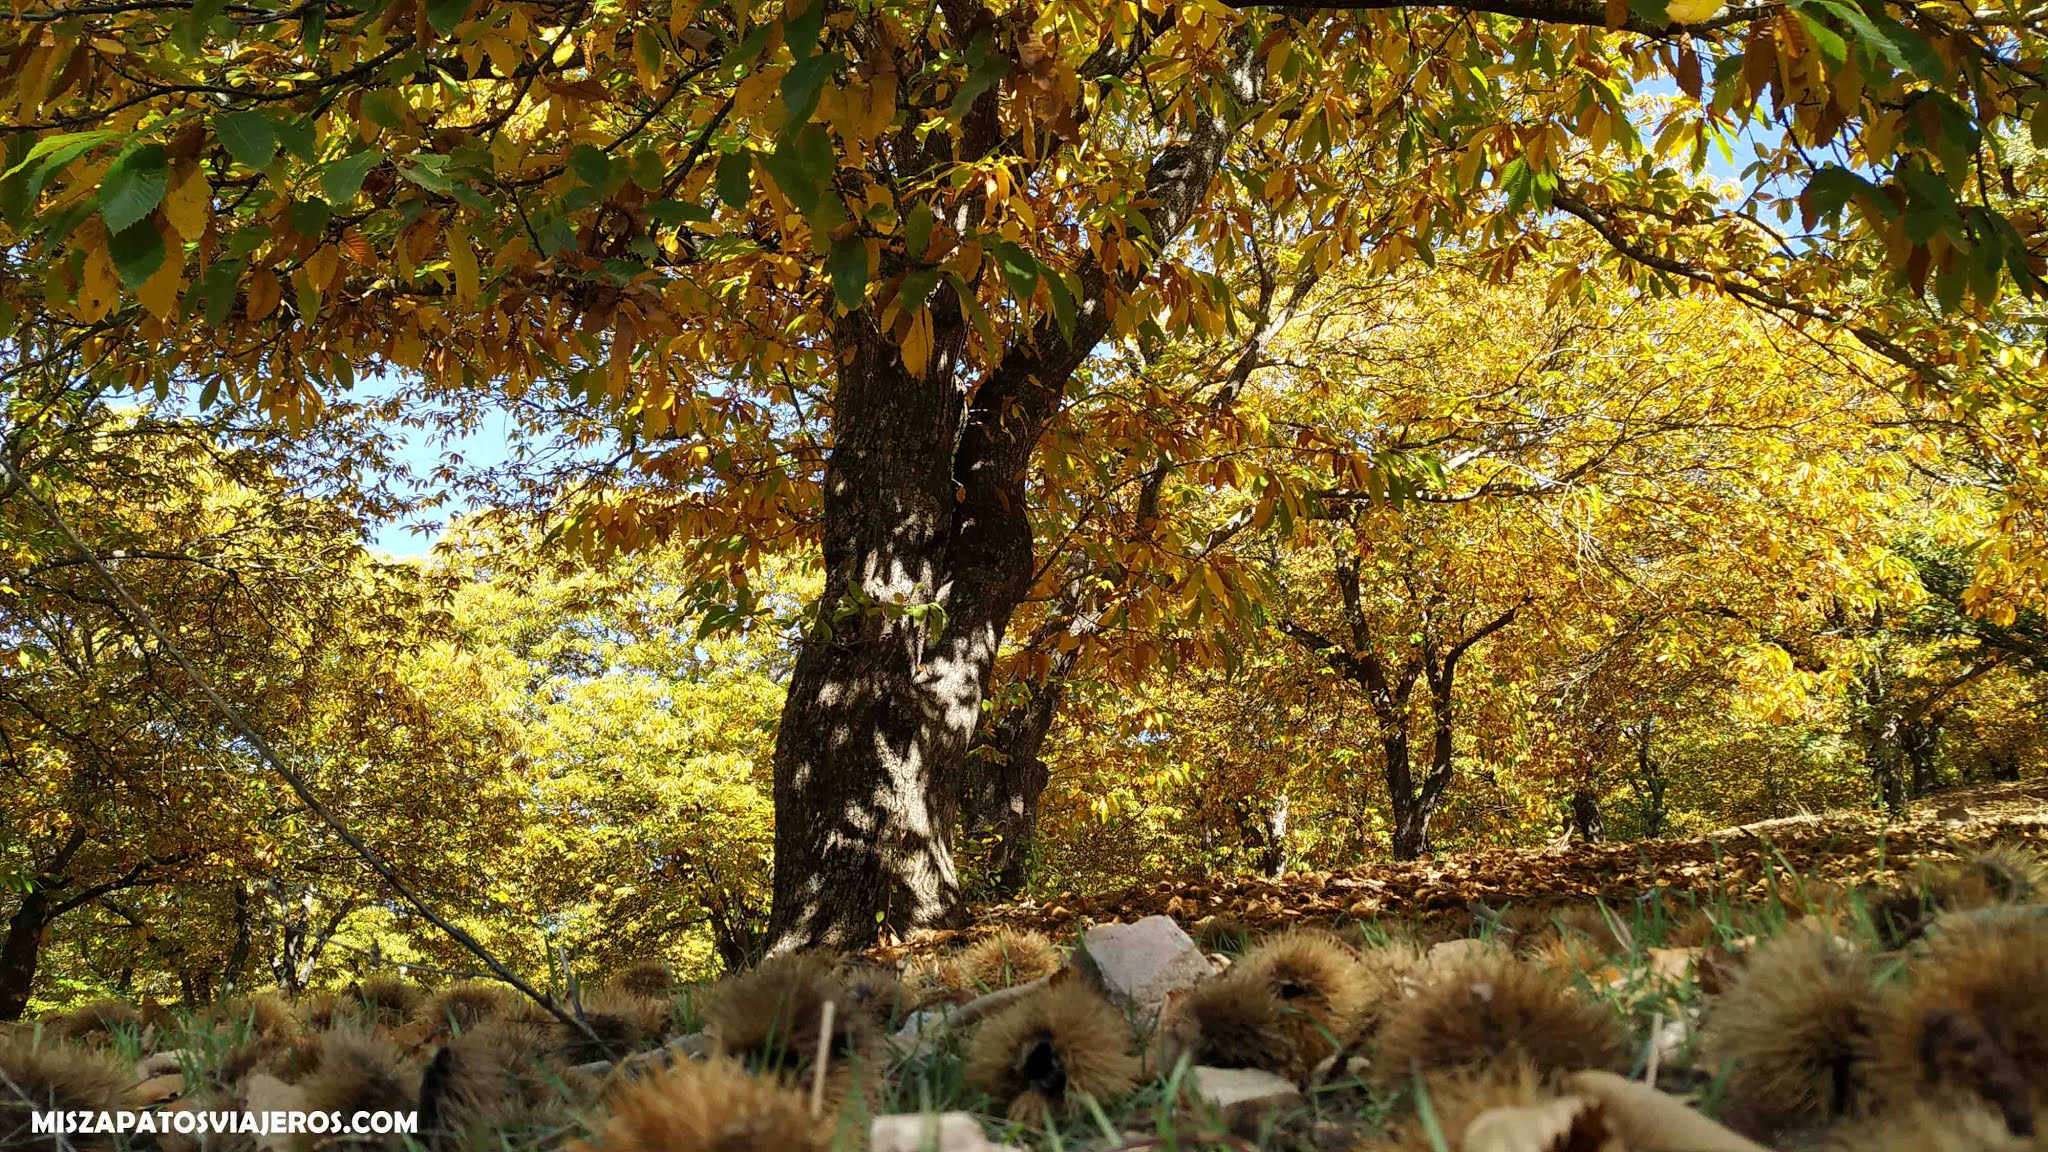 Miszapatosviajeros Bosque Del Cobre De Pujerra A Igualeja Entre Castanos